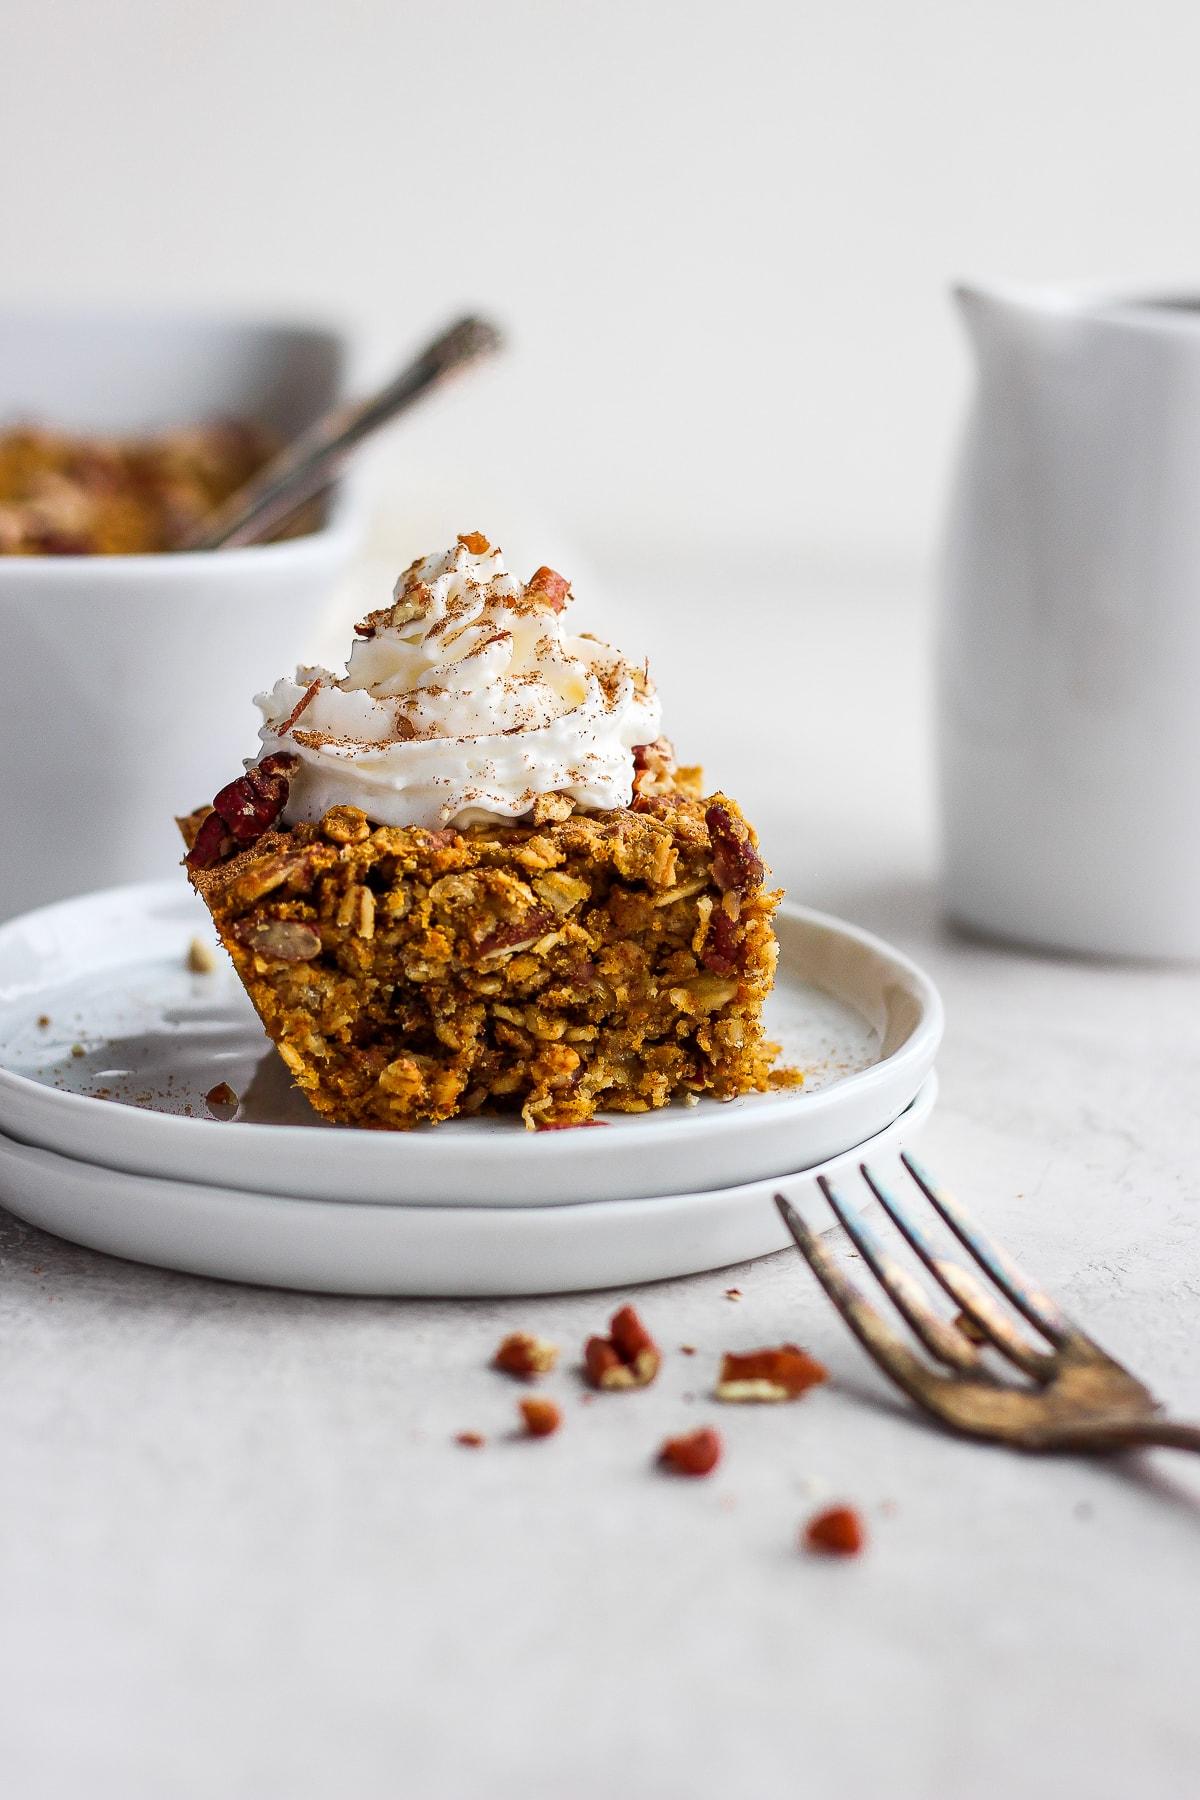 Delicious Dairy-Free Pumpkin Pie Oatmeal Bake - perfect for a crowd this pumpkin pie oatmeal bake tastes just like pumpkin pie but for breakfast!!! Dairy-free and gluten free! #pumpkin #pumpkin pie #oatmealbake #dairyfree #glutenfree